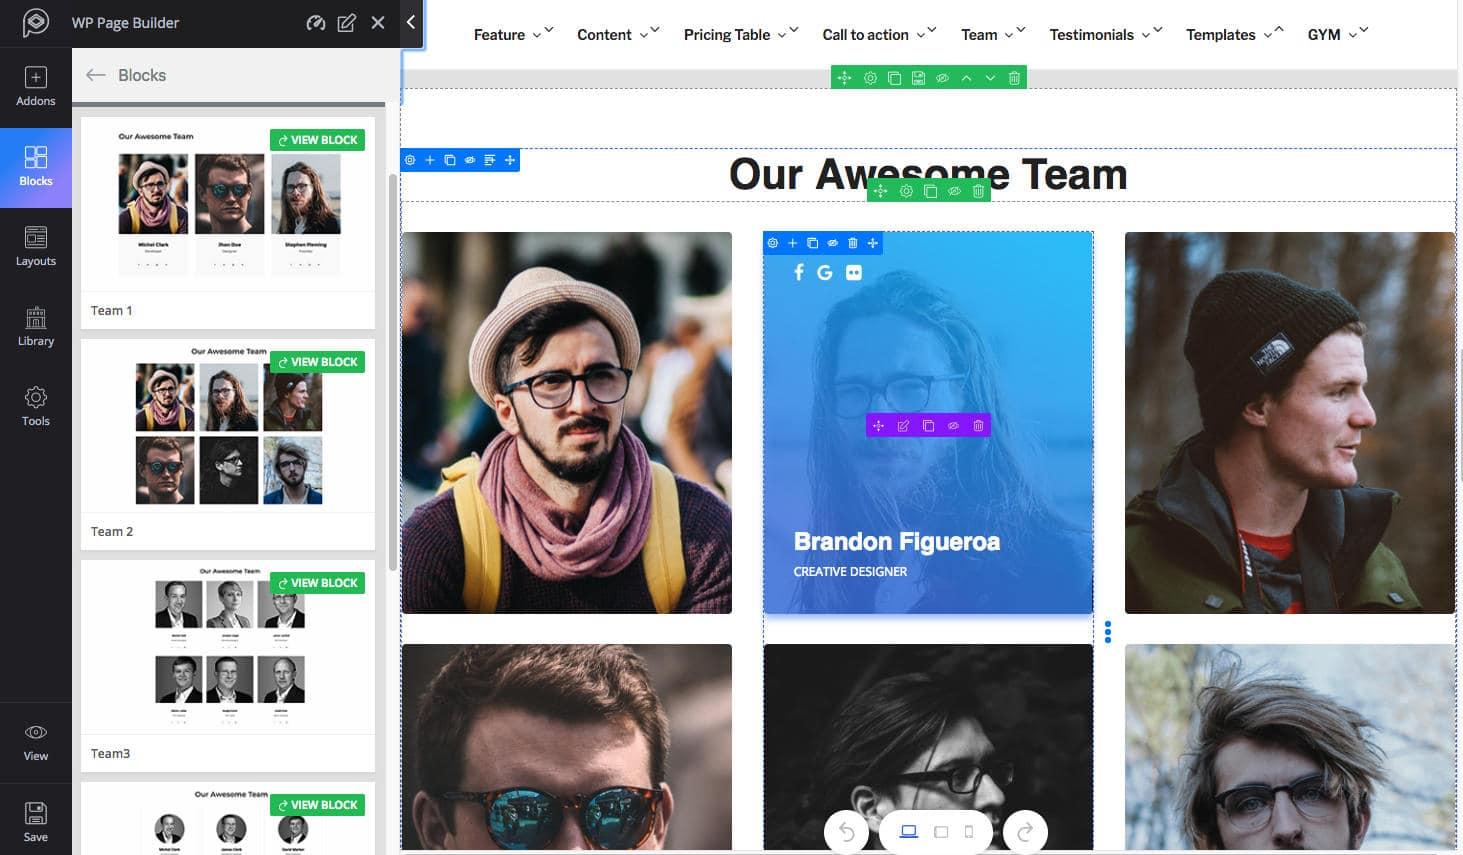 Blocs Team WP Page Builder